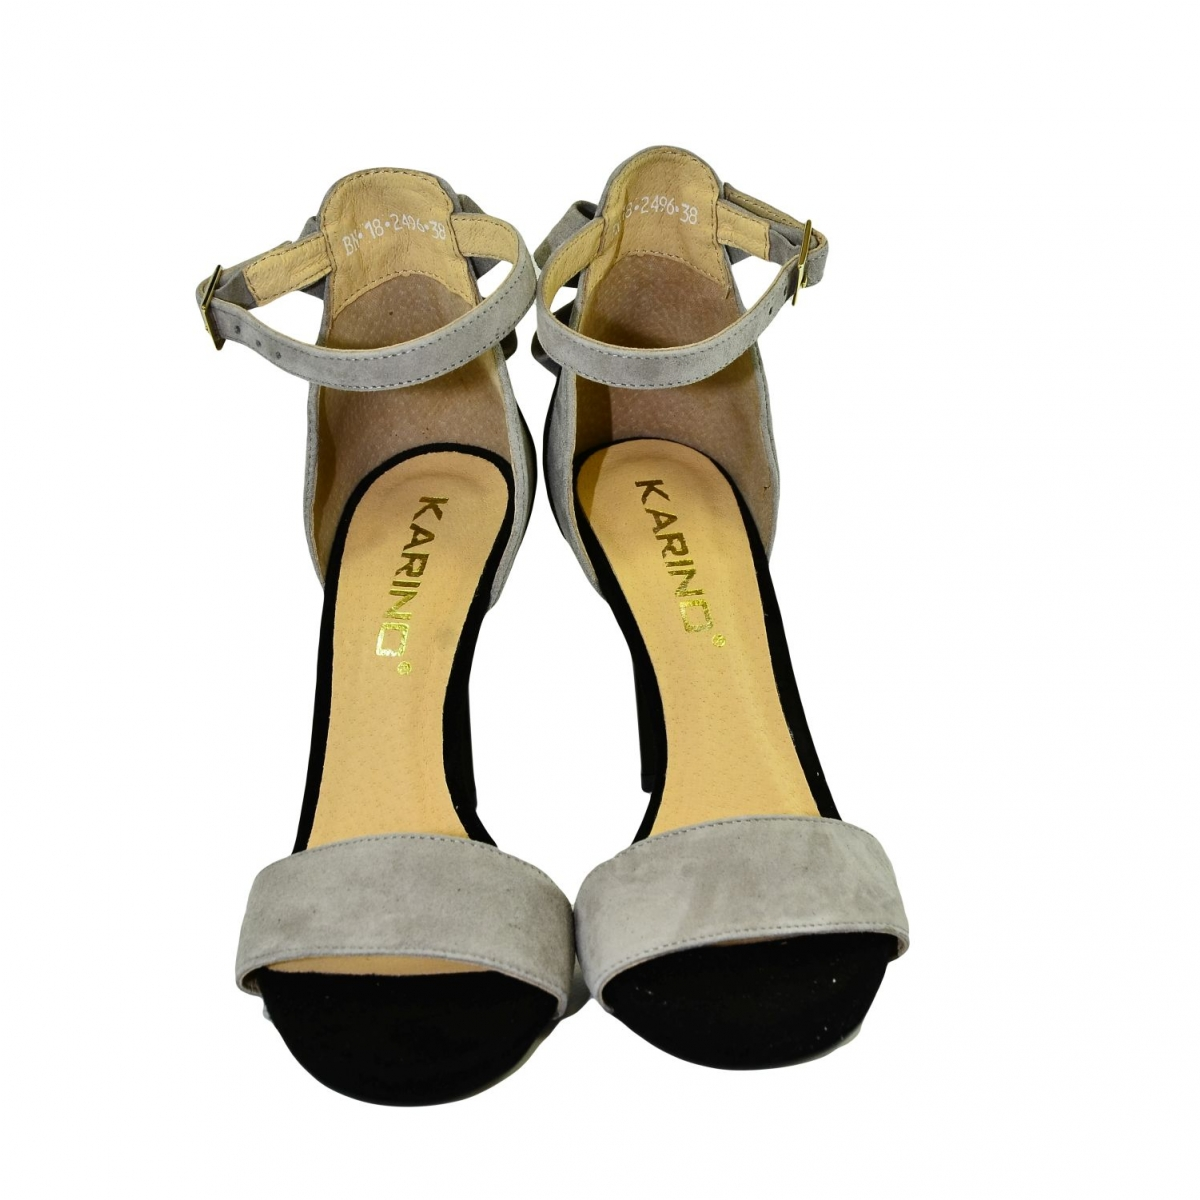 0cc27dd303a3 Dámske sivo-čierne sandále RAILI - 3